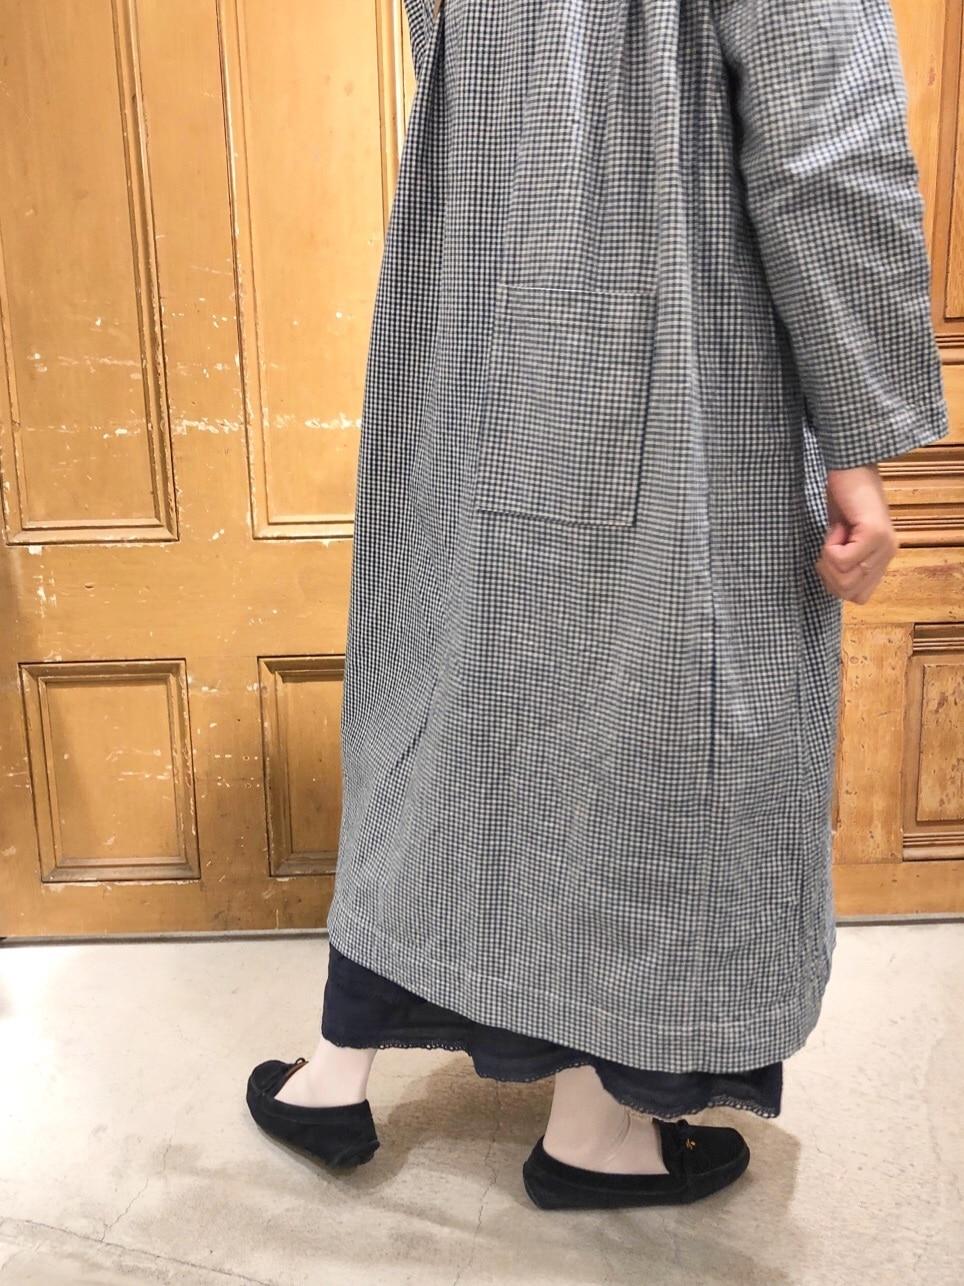 chambre de charme キラリナ京王吉祥寺 身長:163cm 2020.10.20